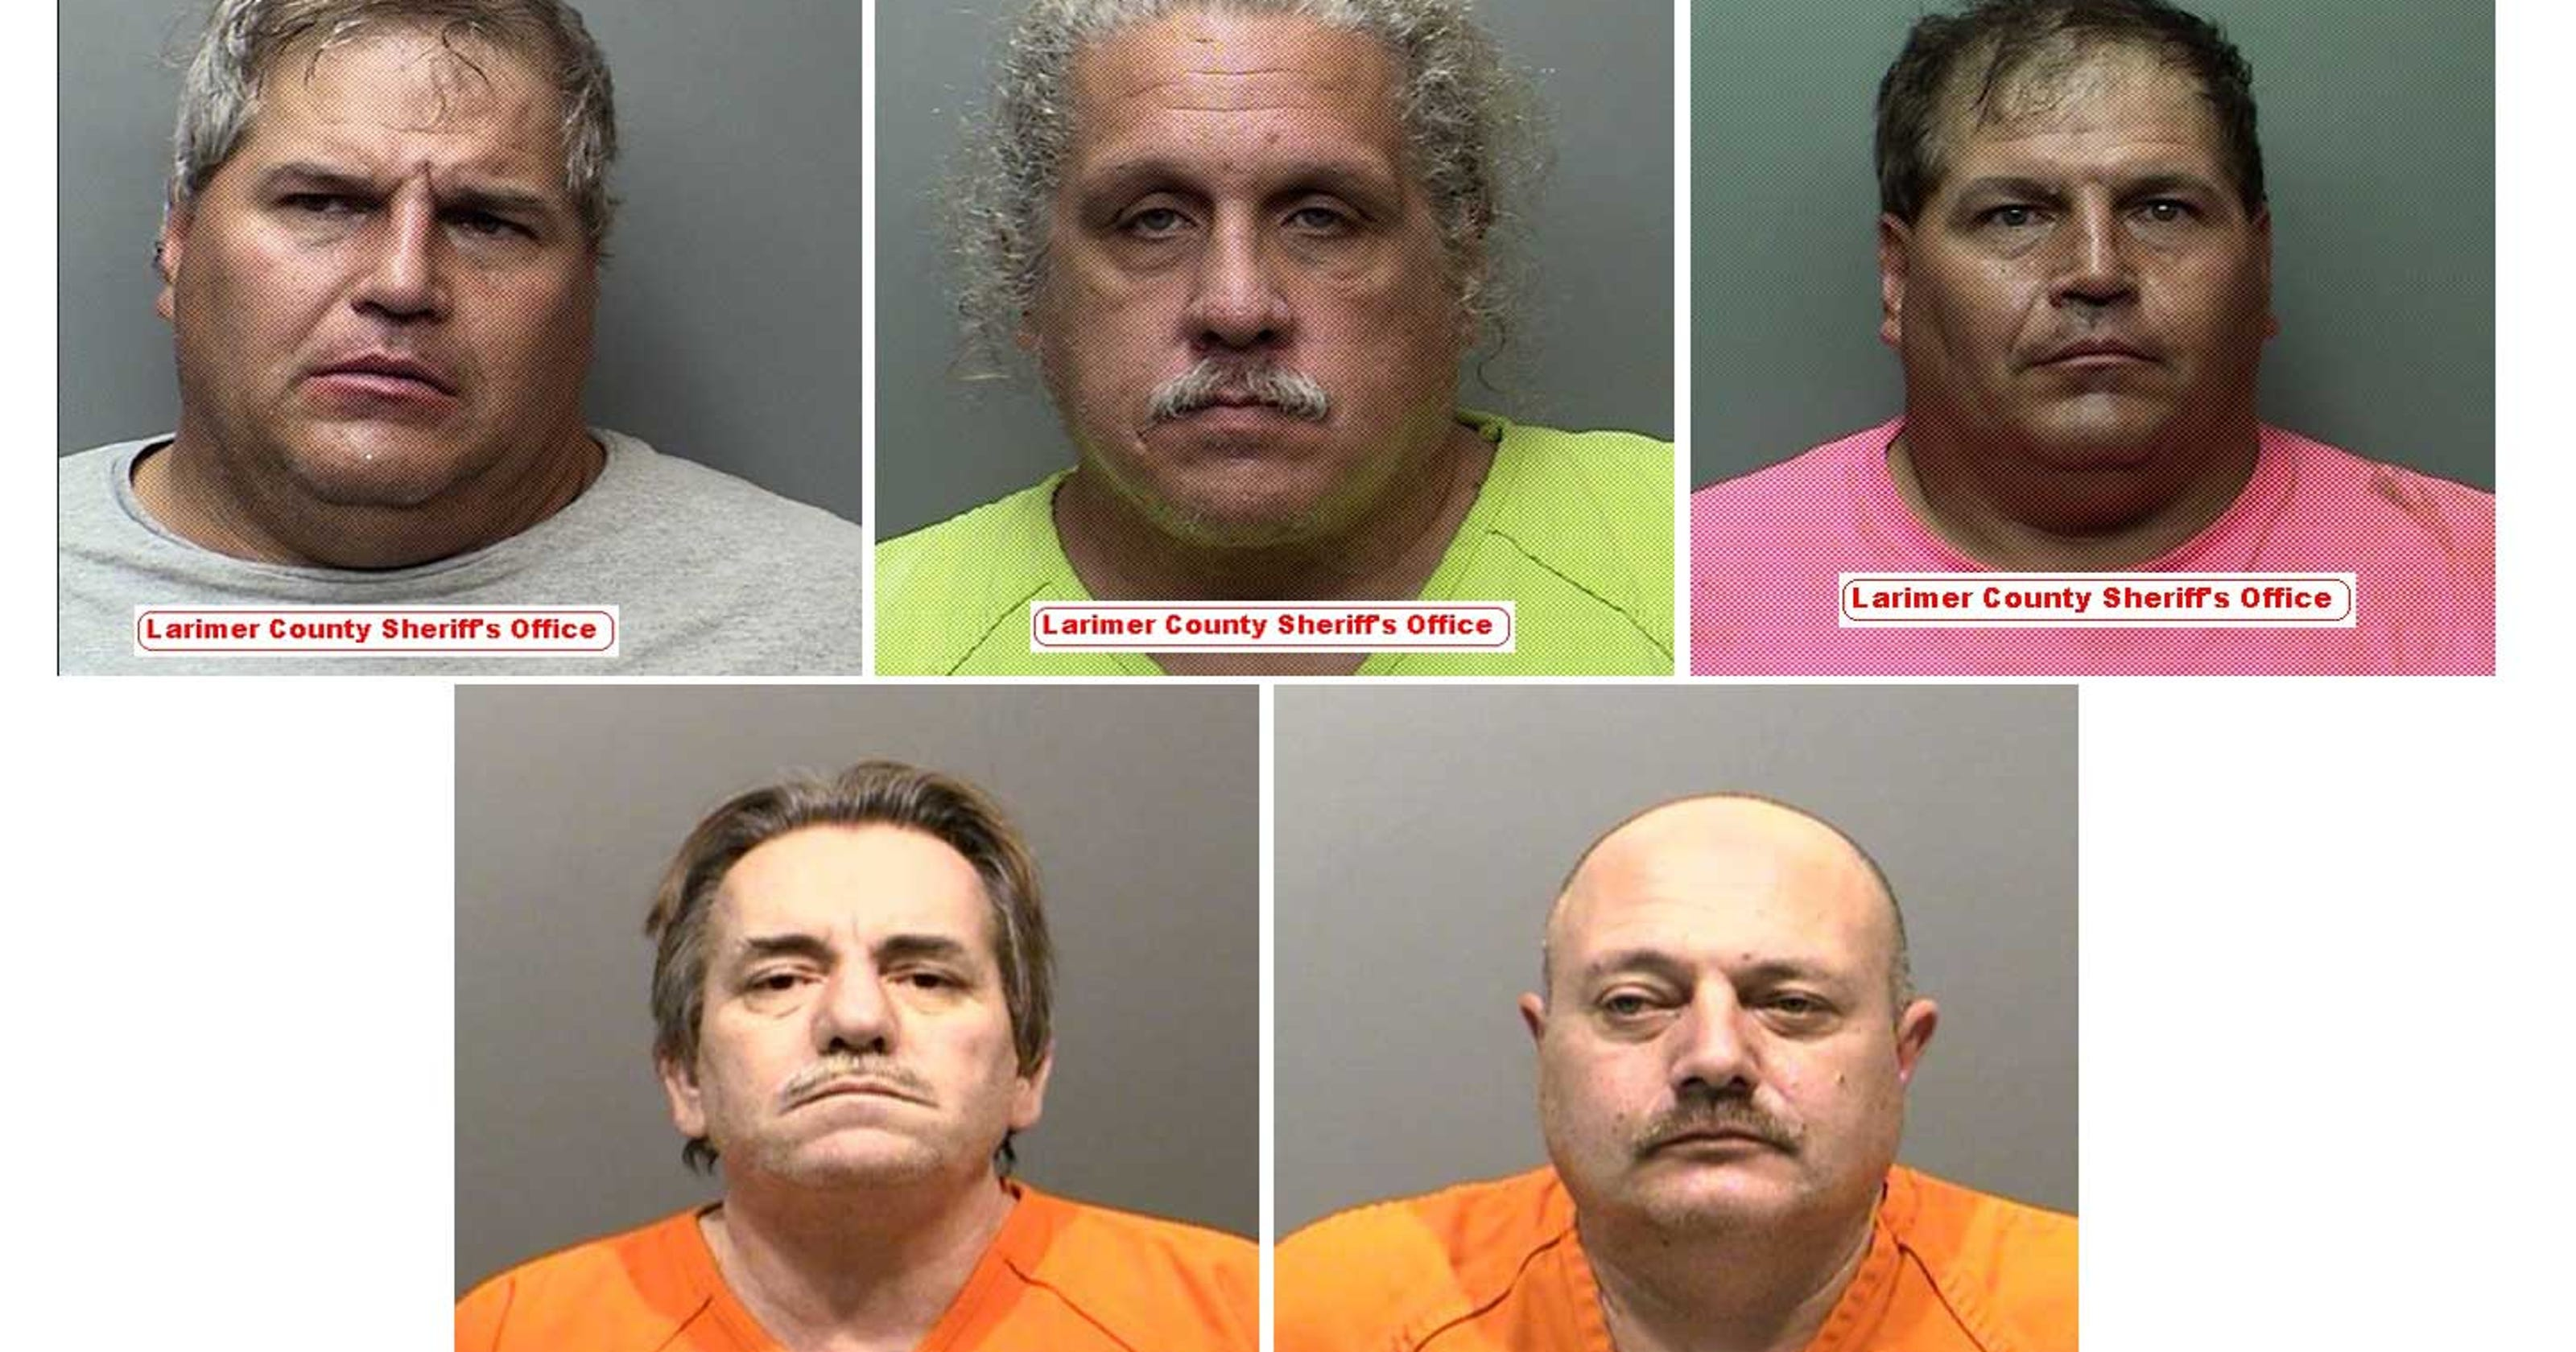 Wiretaps, informants used to bust Larimer meth ring